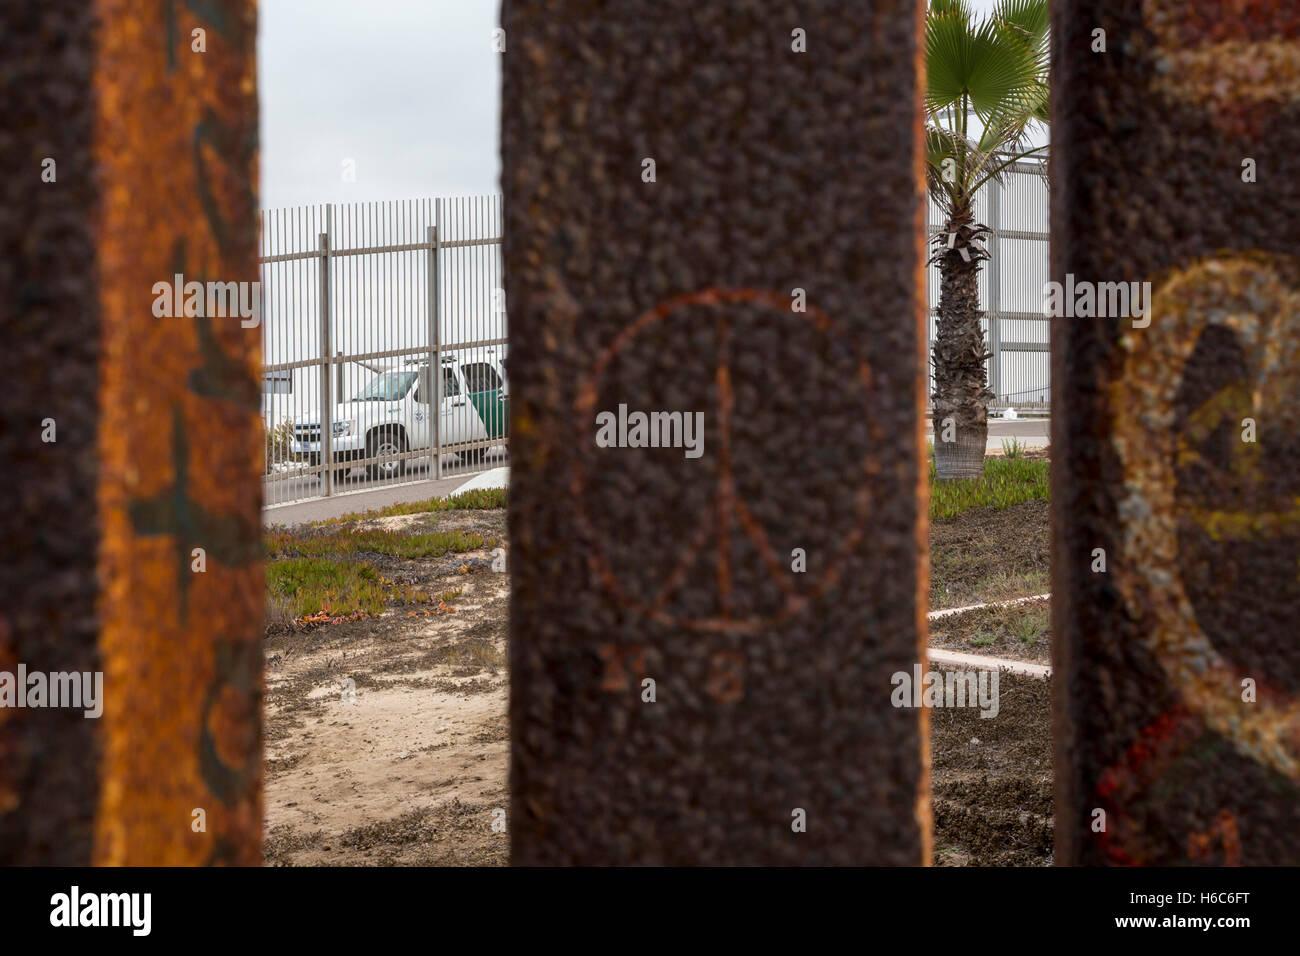 Tijuana, Mexico - A U.S. Border Patrol vehicle beyond two border fences near the Pacific Ocean. - Stock Image